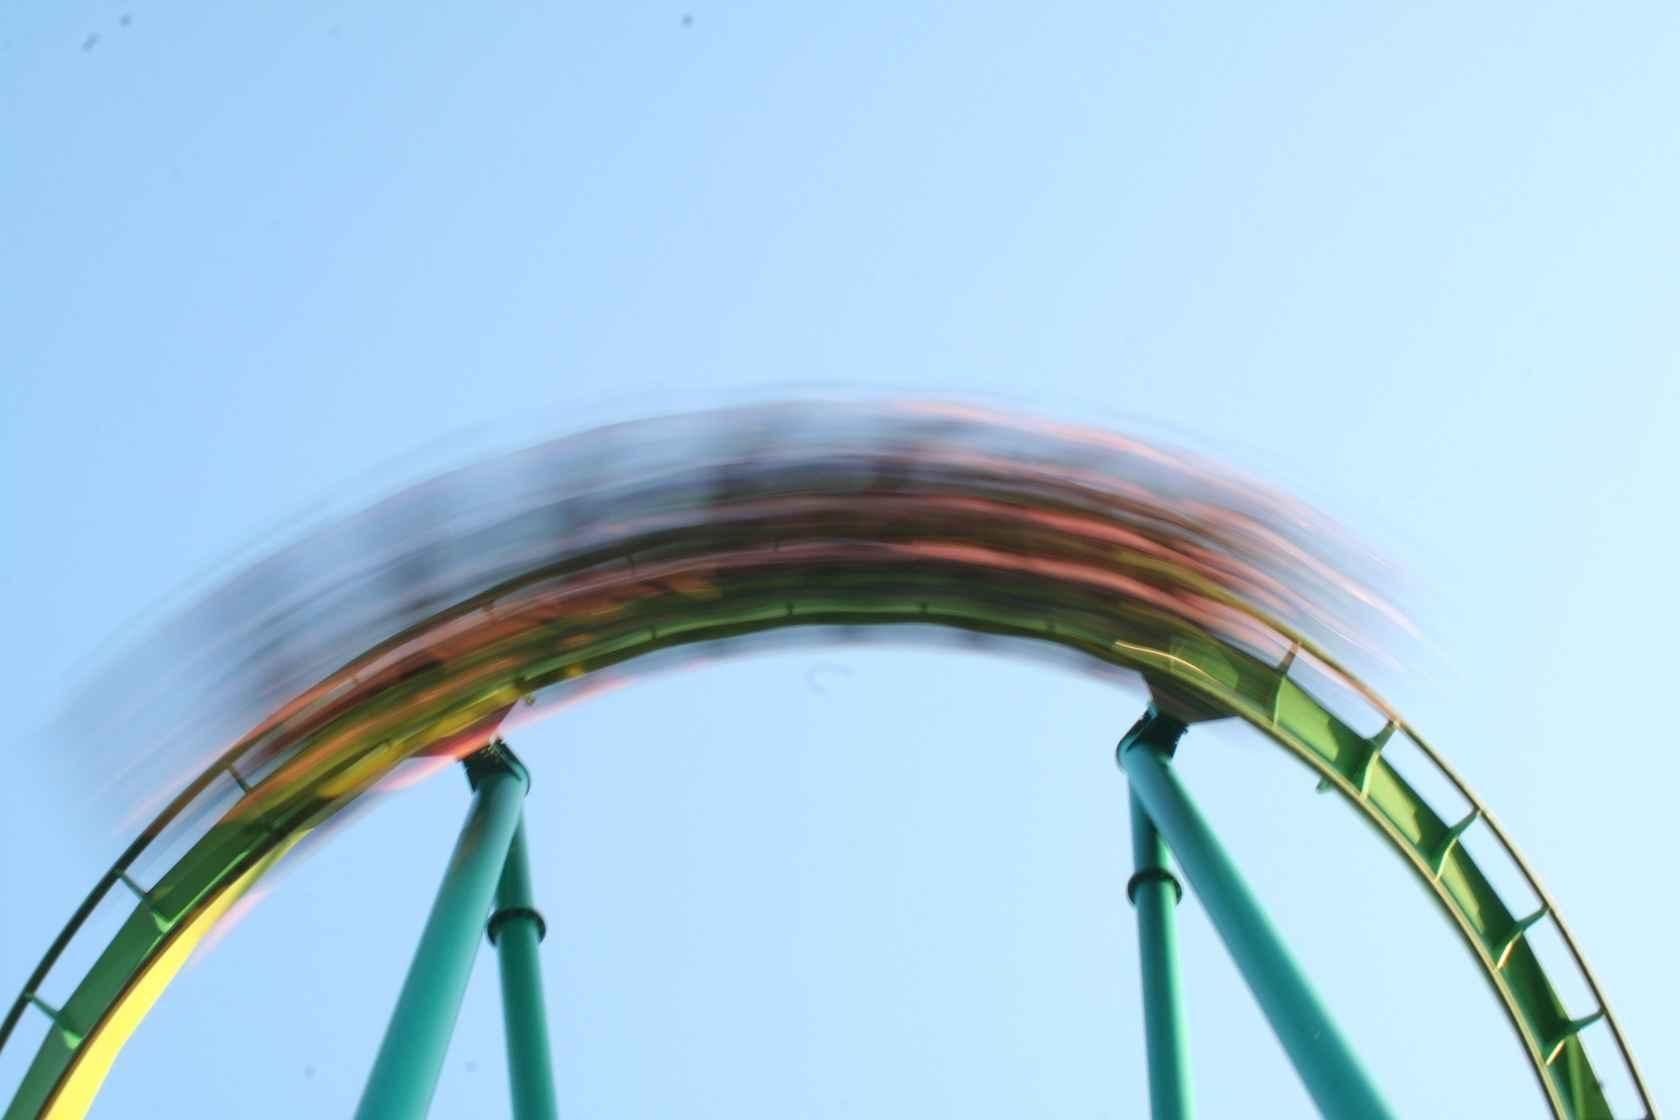 Rollercoaster_From_Hell-Grief-EmilyAnnPeterson.com.jpg